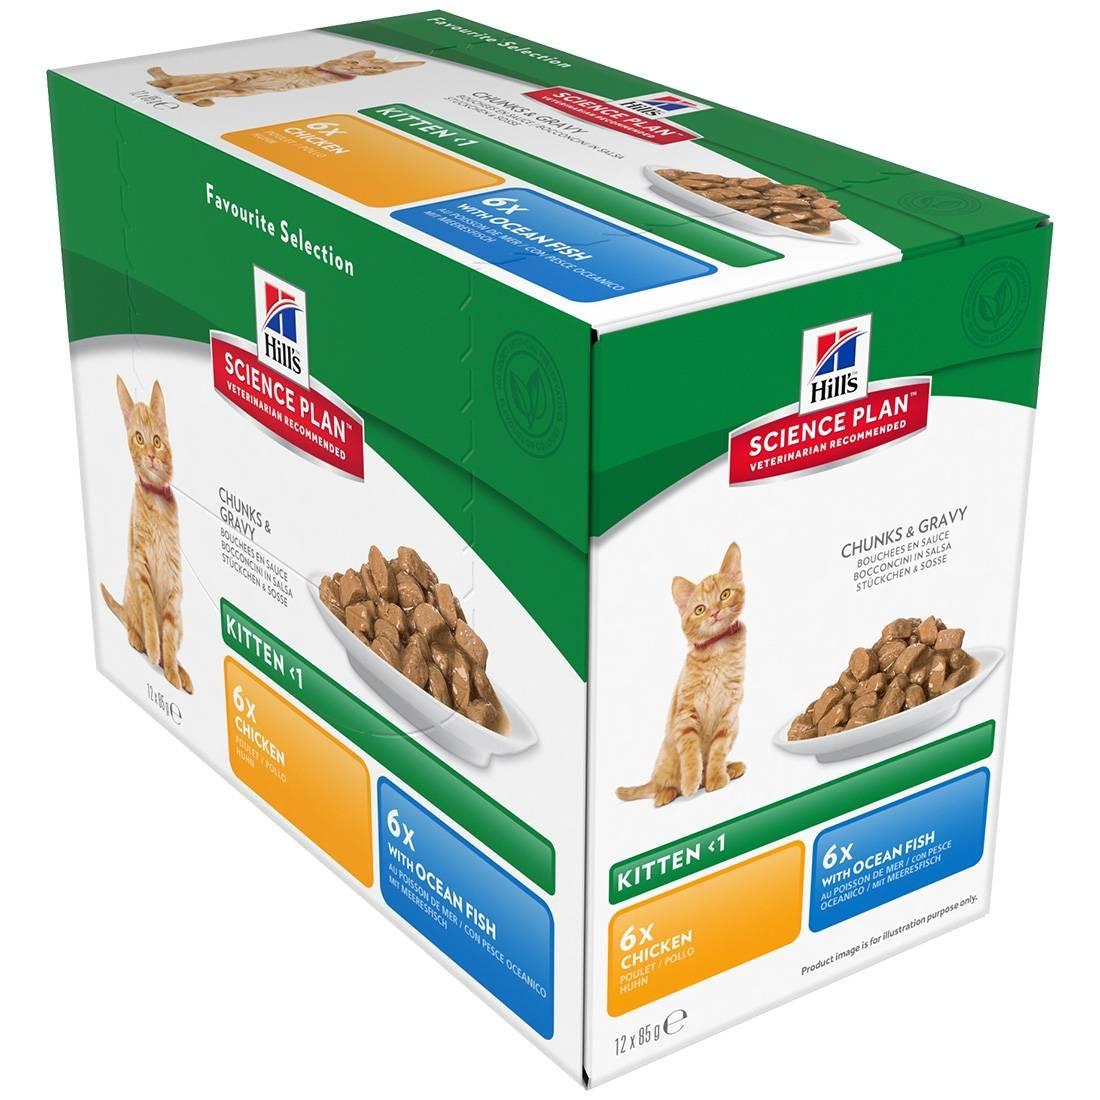 Hill's Science Plan Sachets repas Hill's Science Plan Kitten Contenance : 12 sachets de 85 g, Saveur : 6 x Chicken + 6 x Ocean Fish